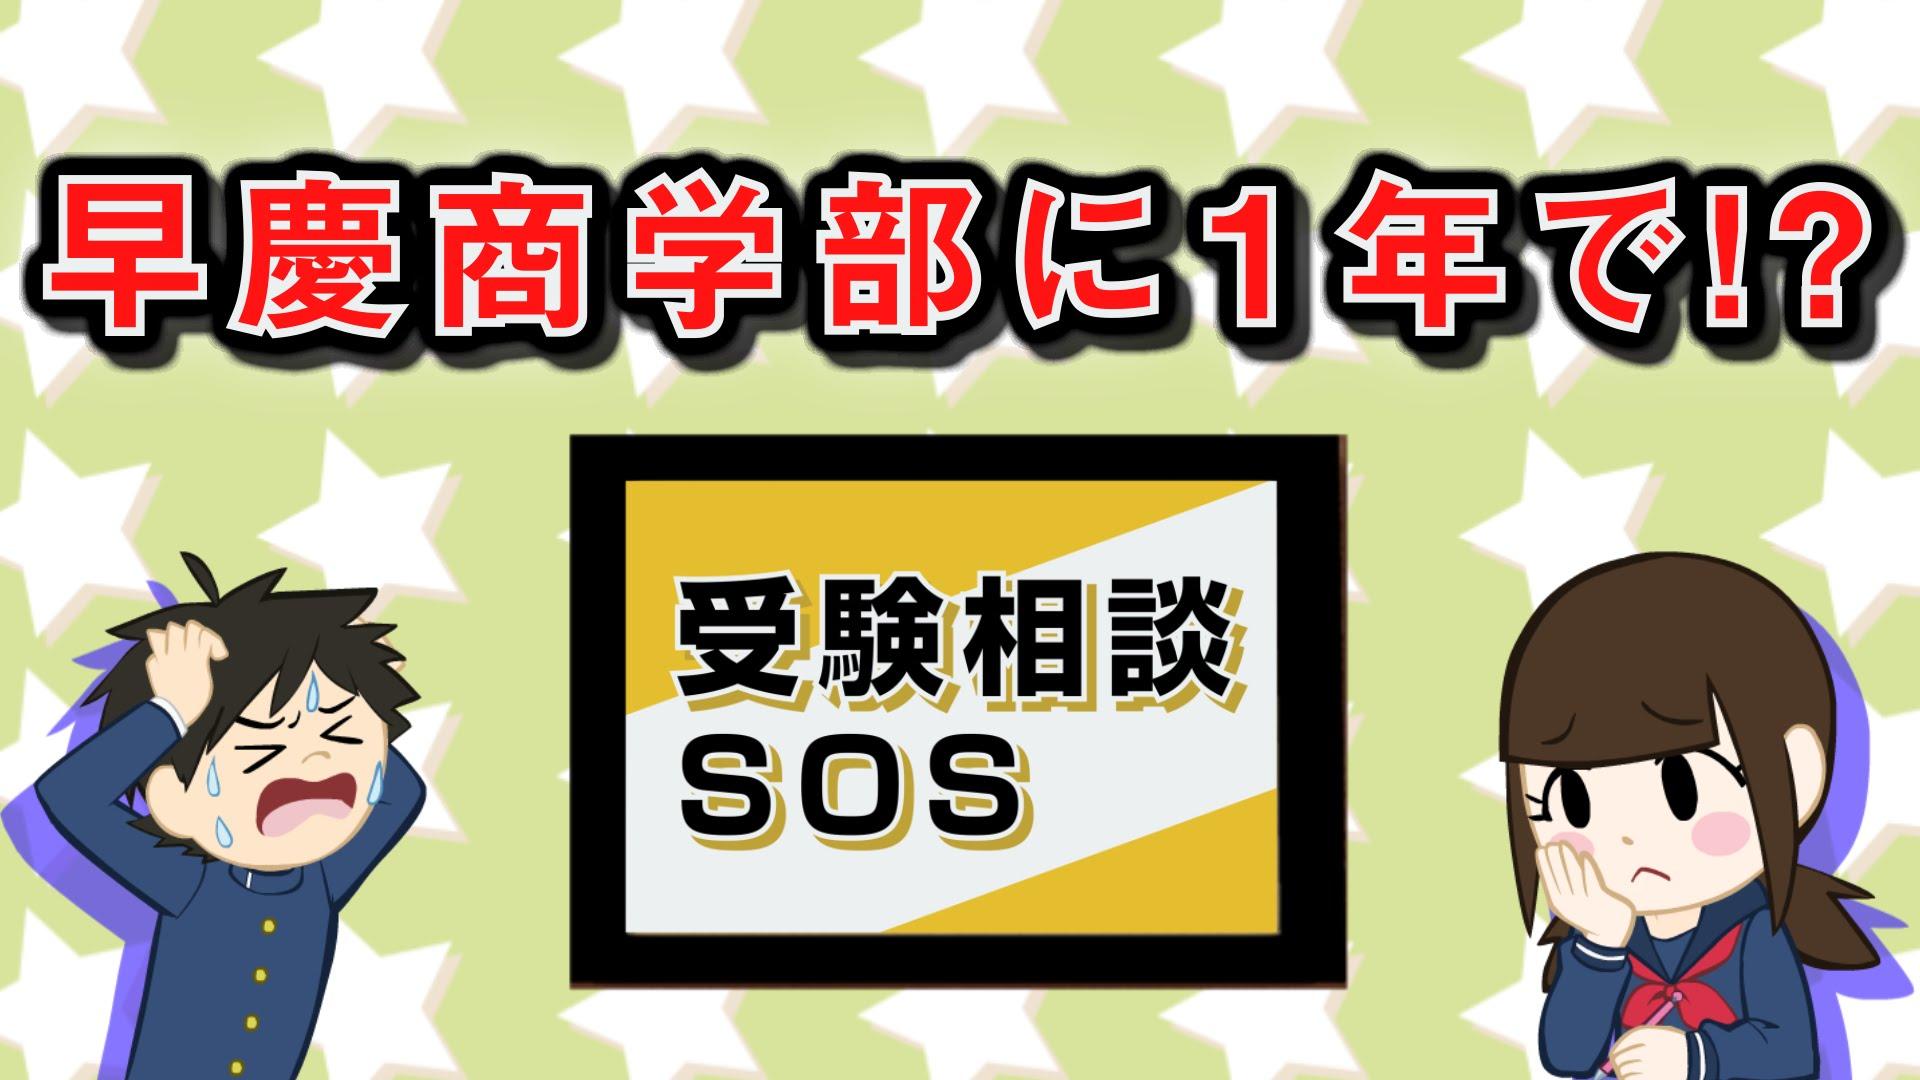 【vol.60】早稲田・慶應商学部に1年で合格!?|受験相談SOS